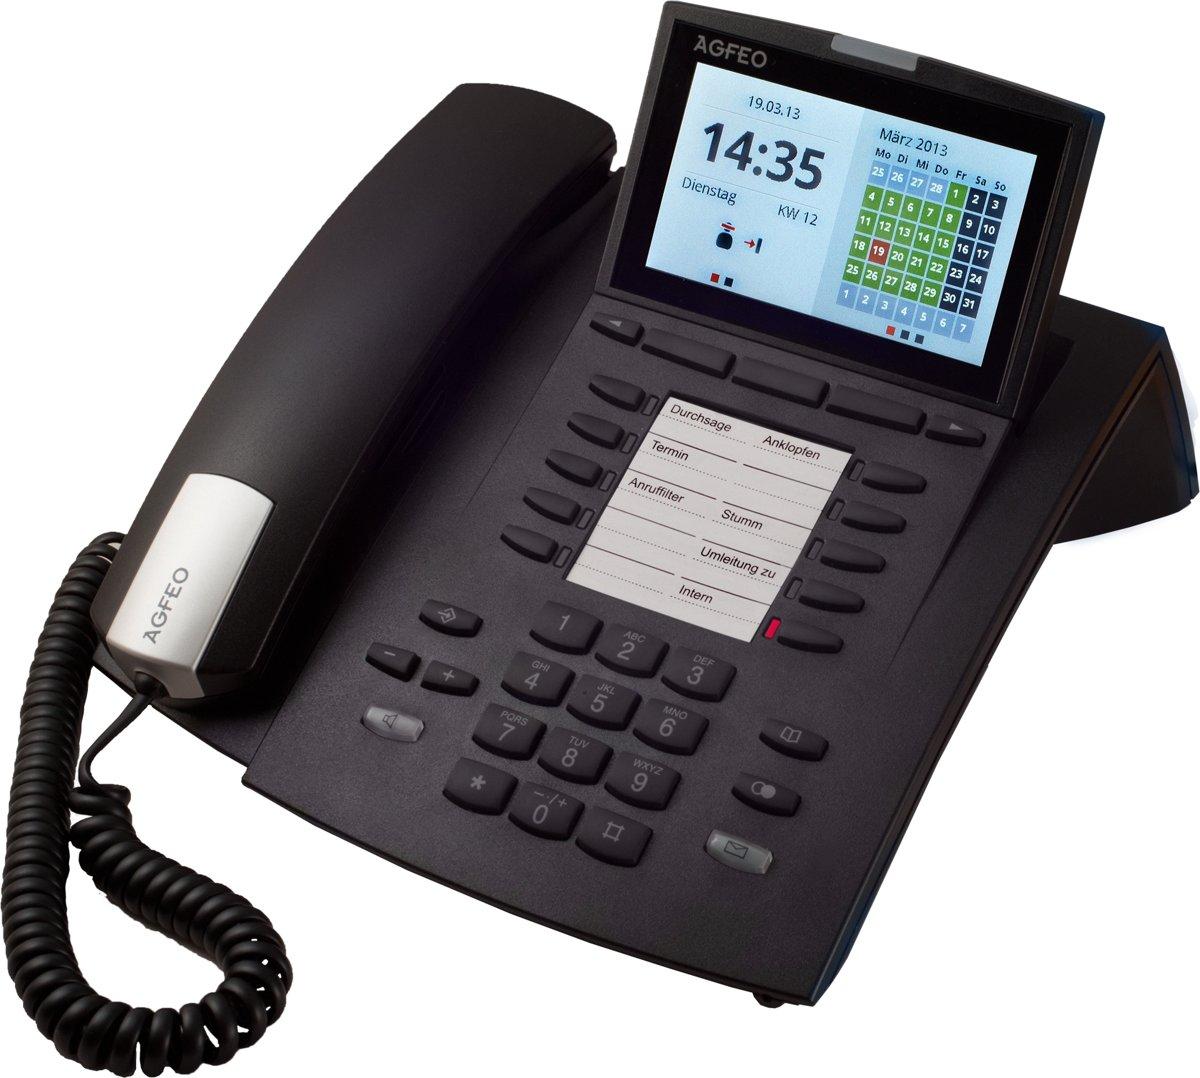 AGFEO ST45 IP - VoIP telefoon - Zwart